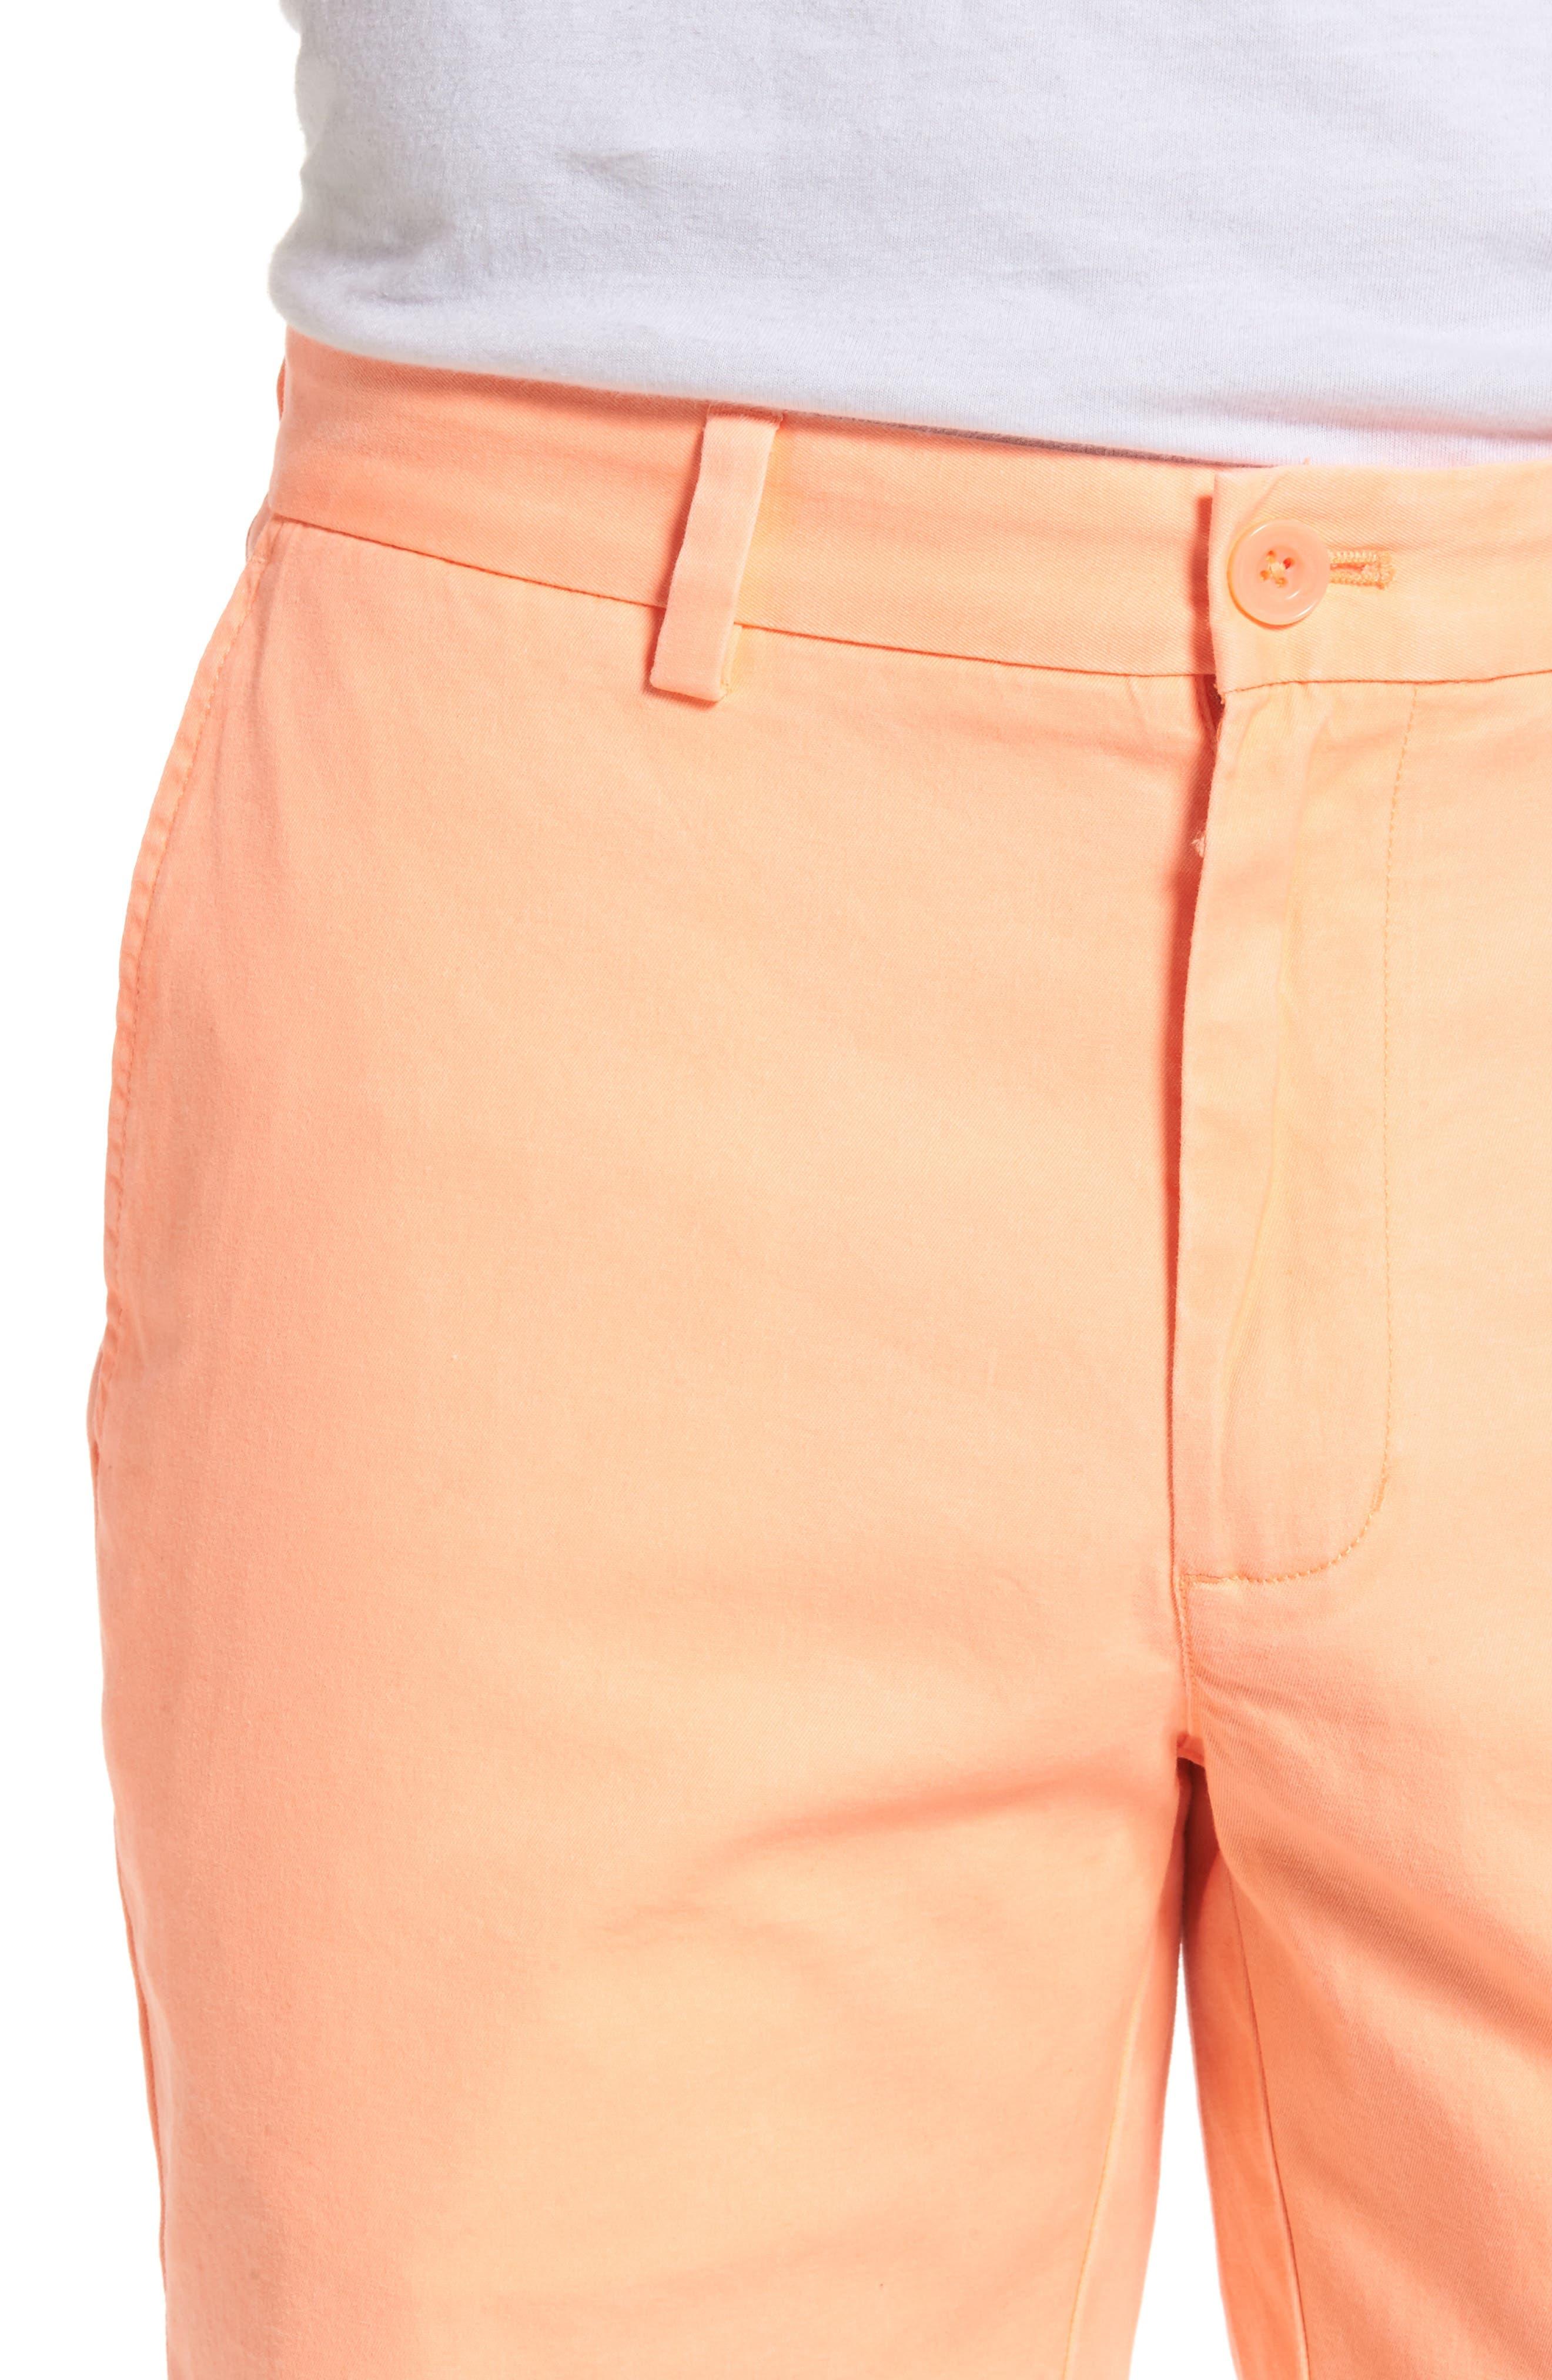 7 Inch Breaker Stretch Shorts,                             Alternate thumbnail 4, color,                             885